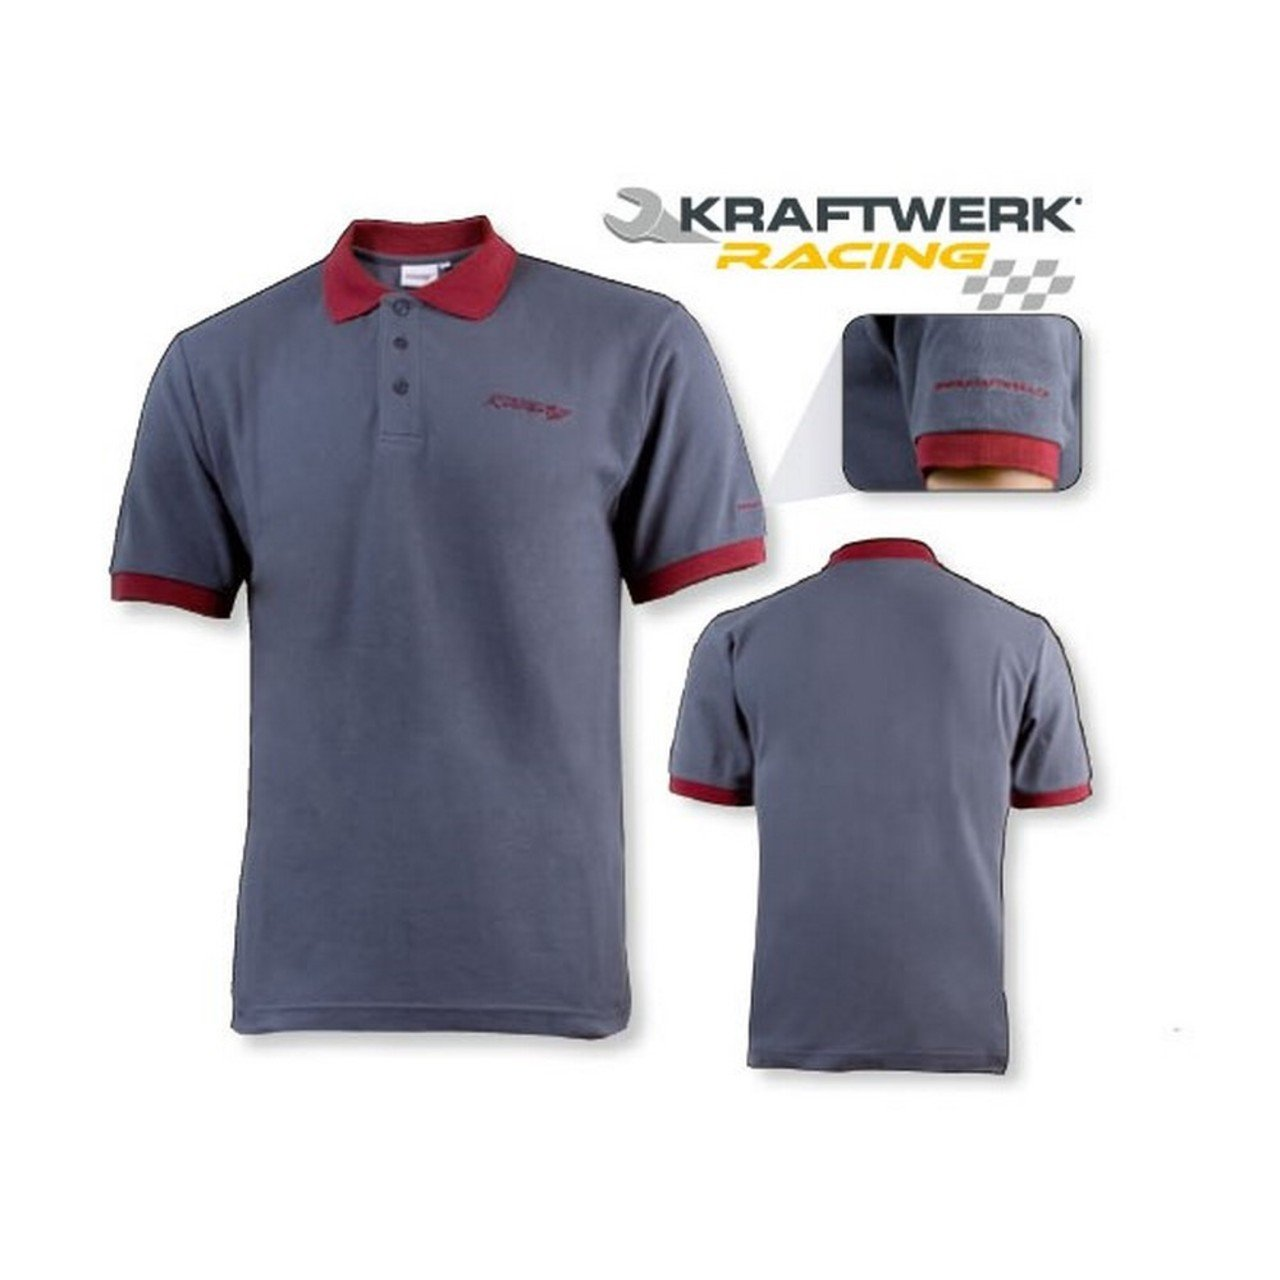 KRAFTWERK 90154XL - KRAFTWERK polo XL